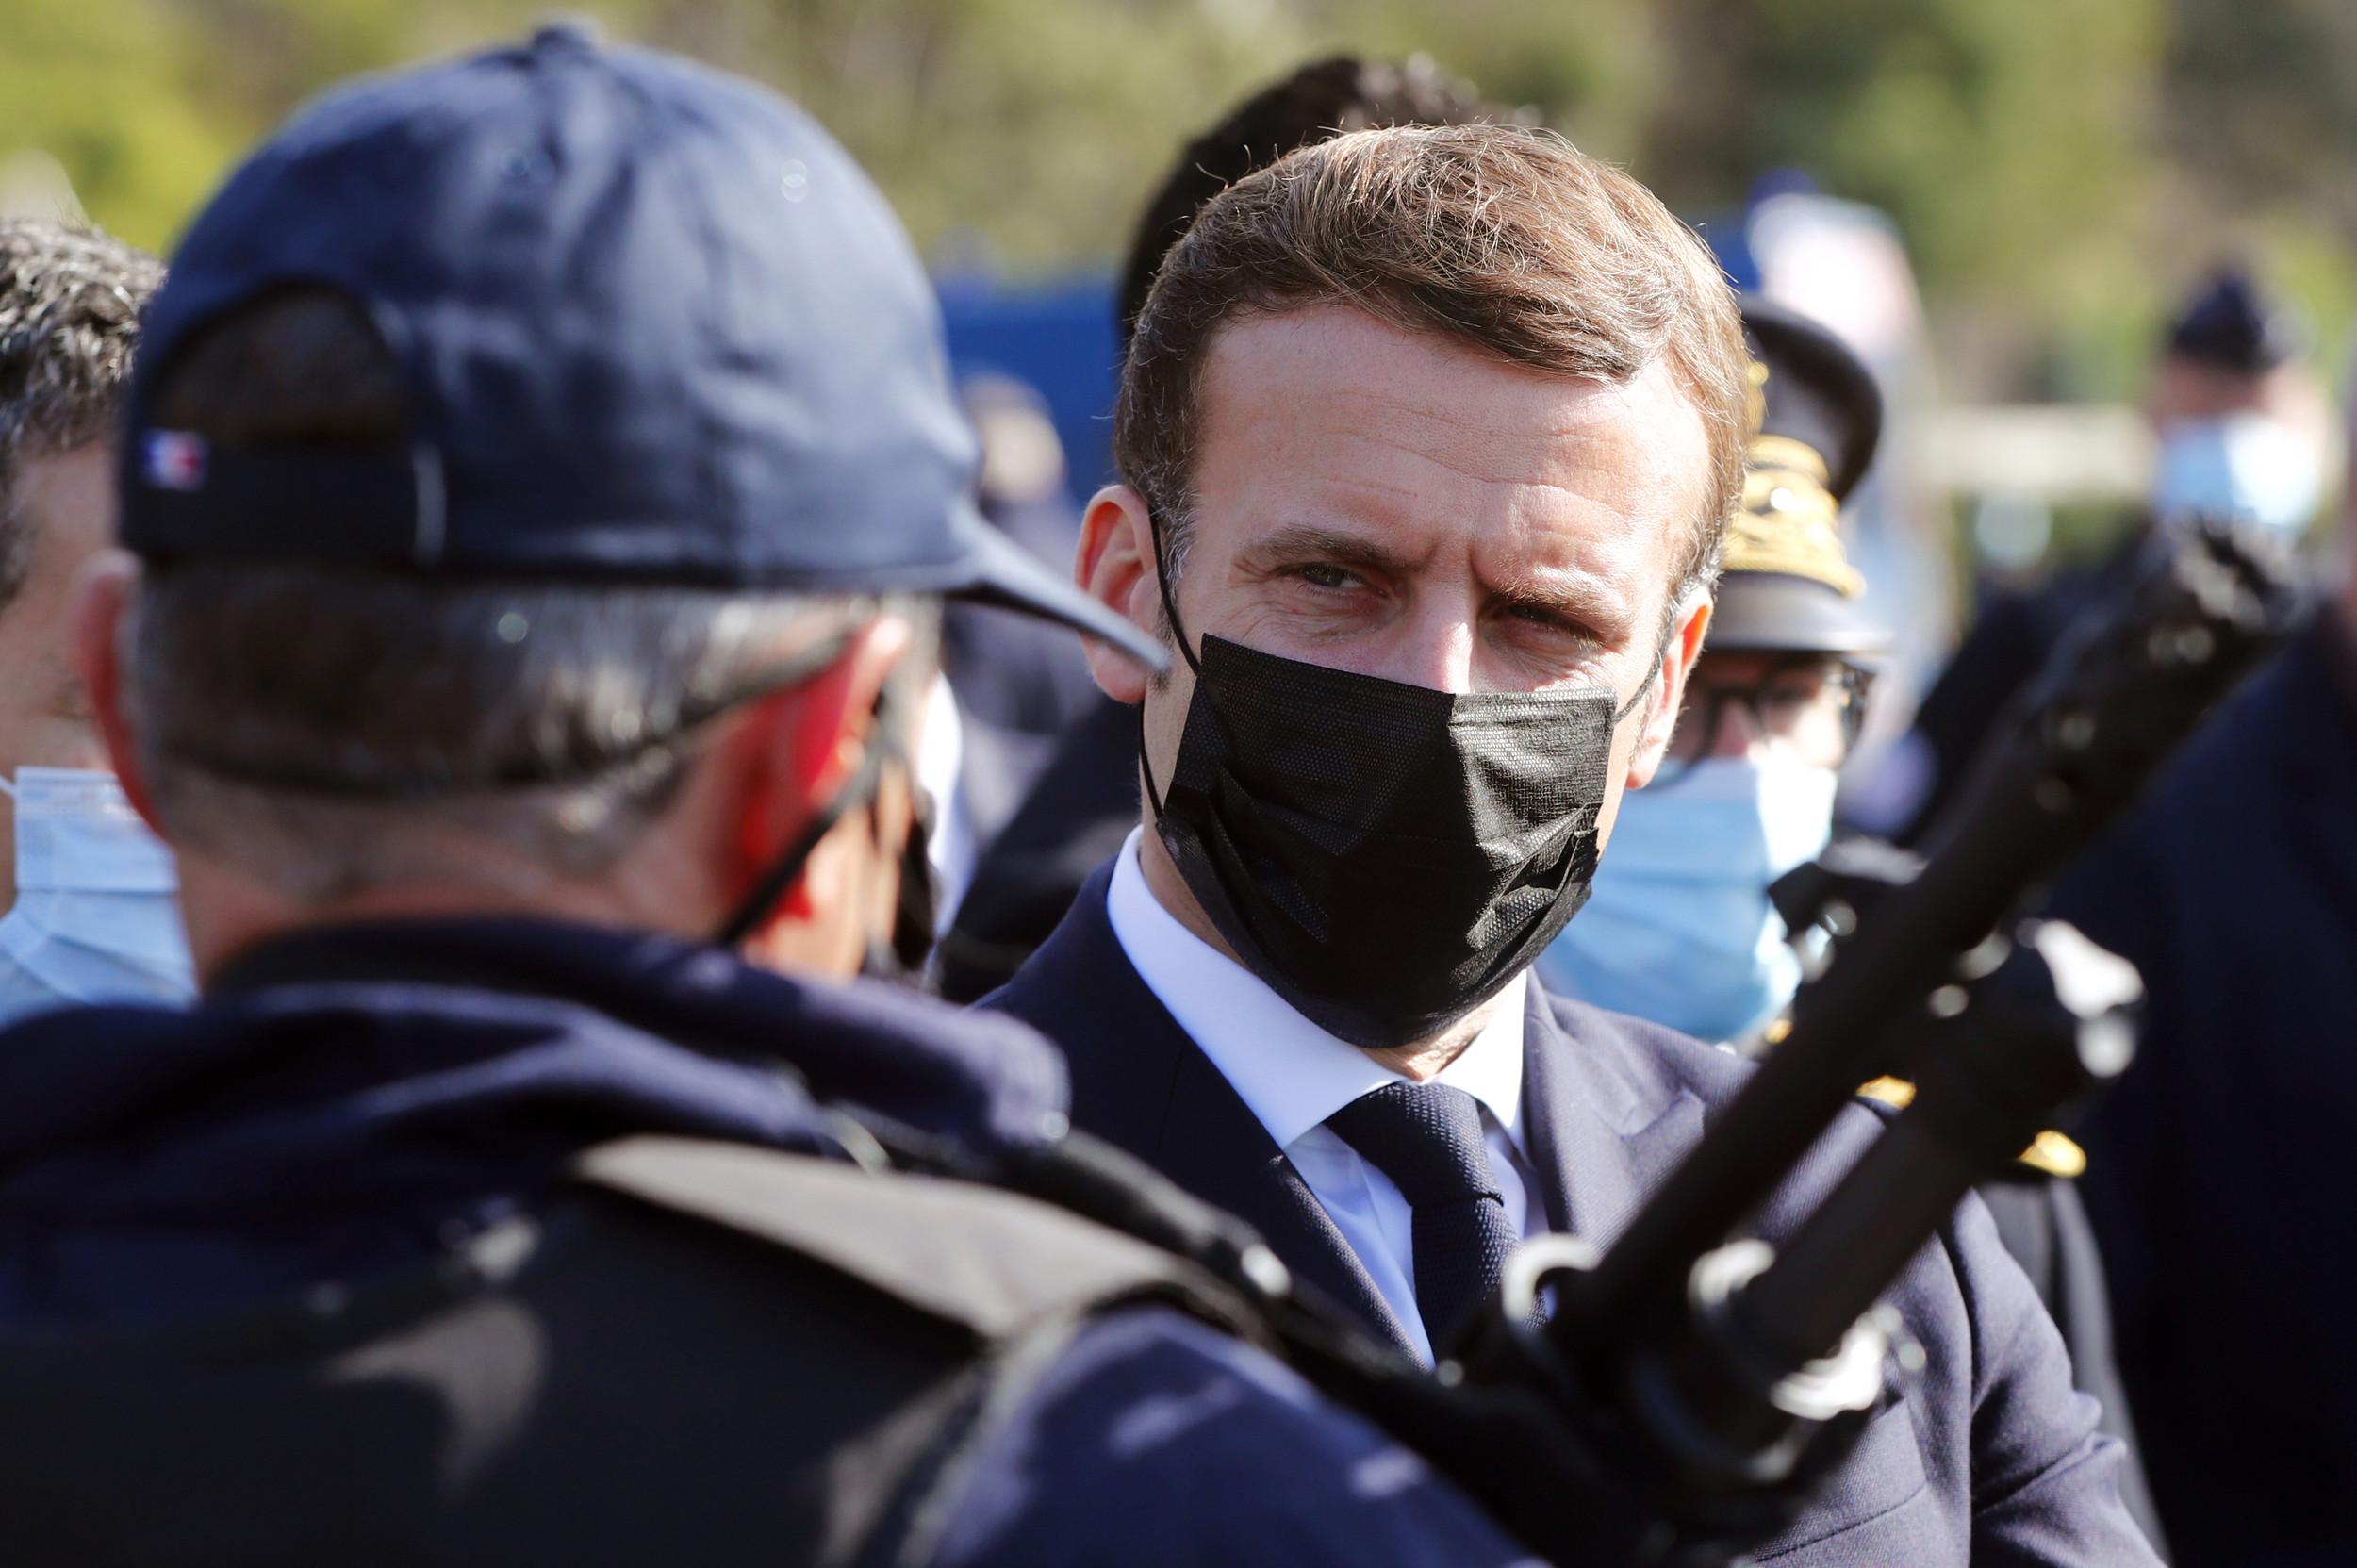 France boosts its border controls after terrorist attacks